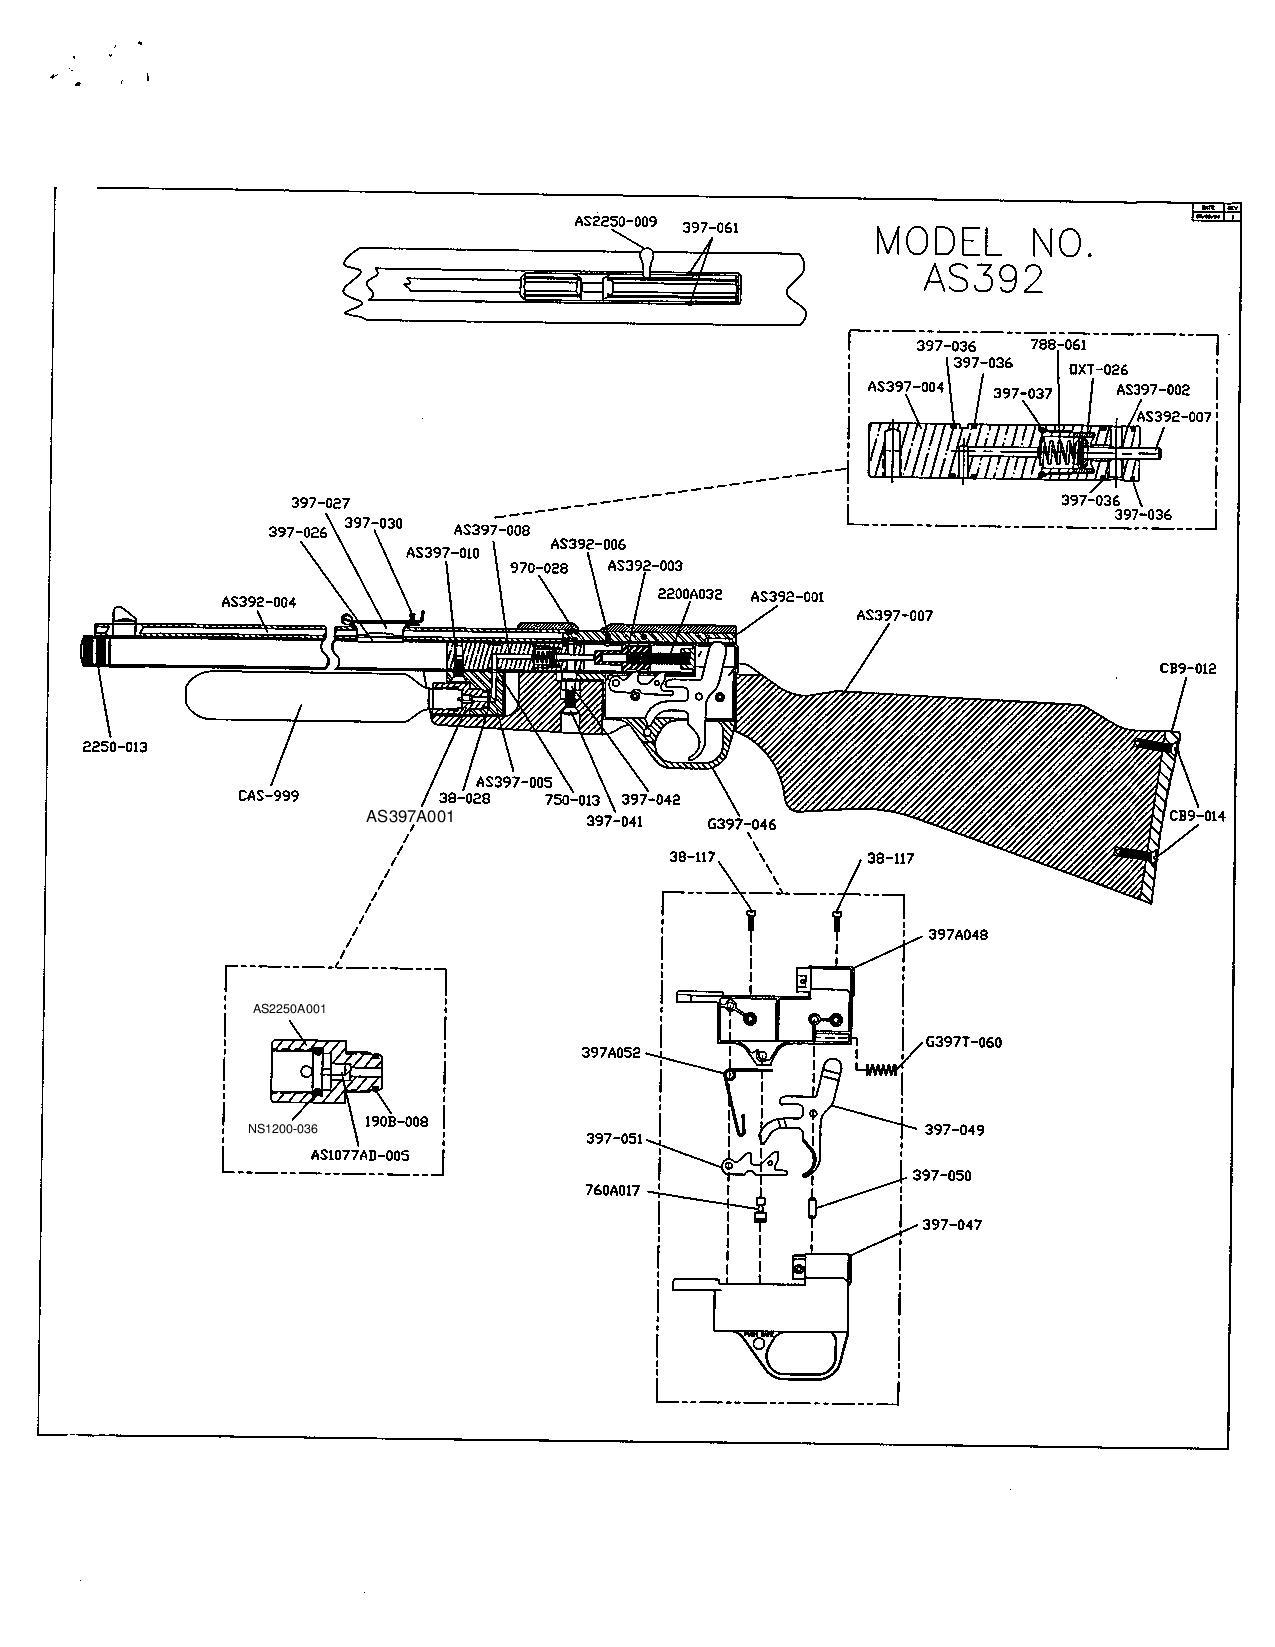 Benjamin AS392 & AS392T Buccaneer - Bagnall and Kirkwood Airgun Spares